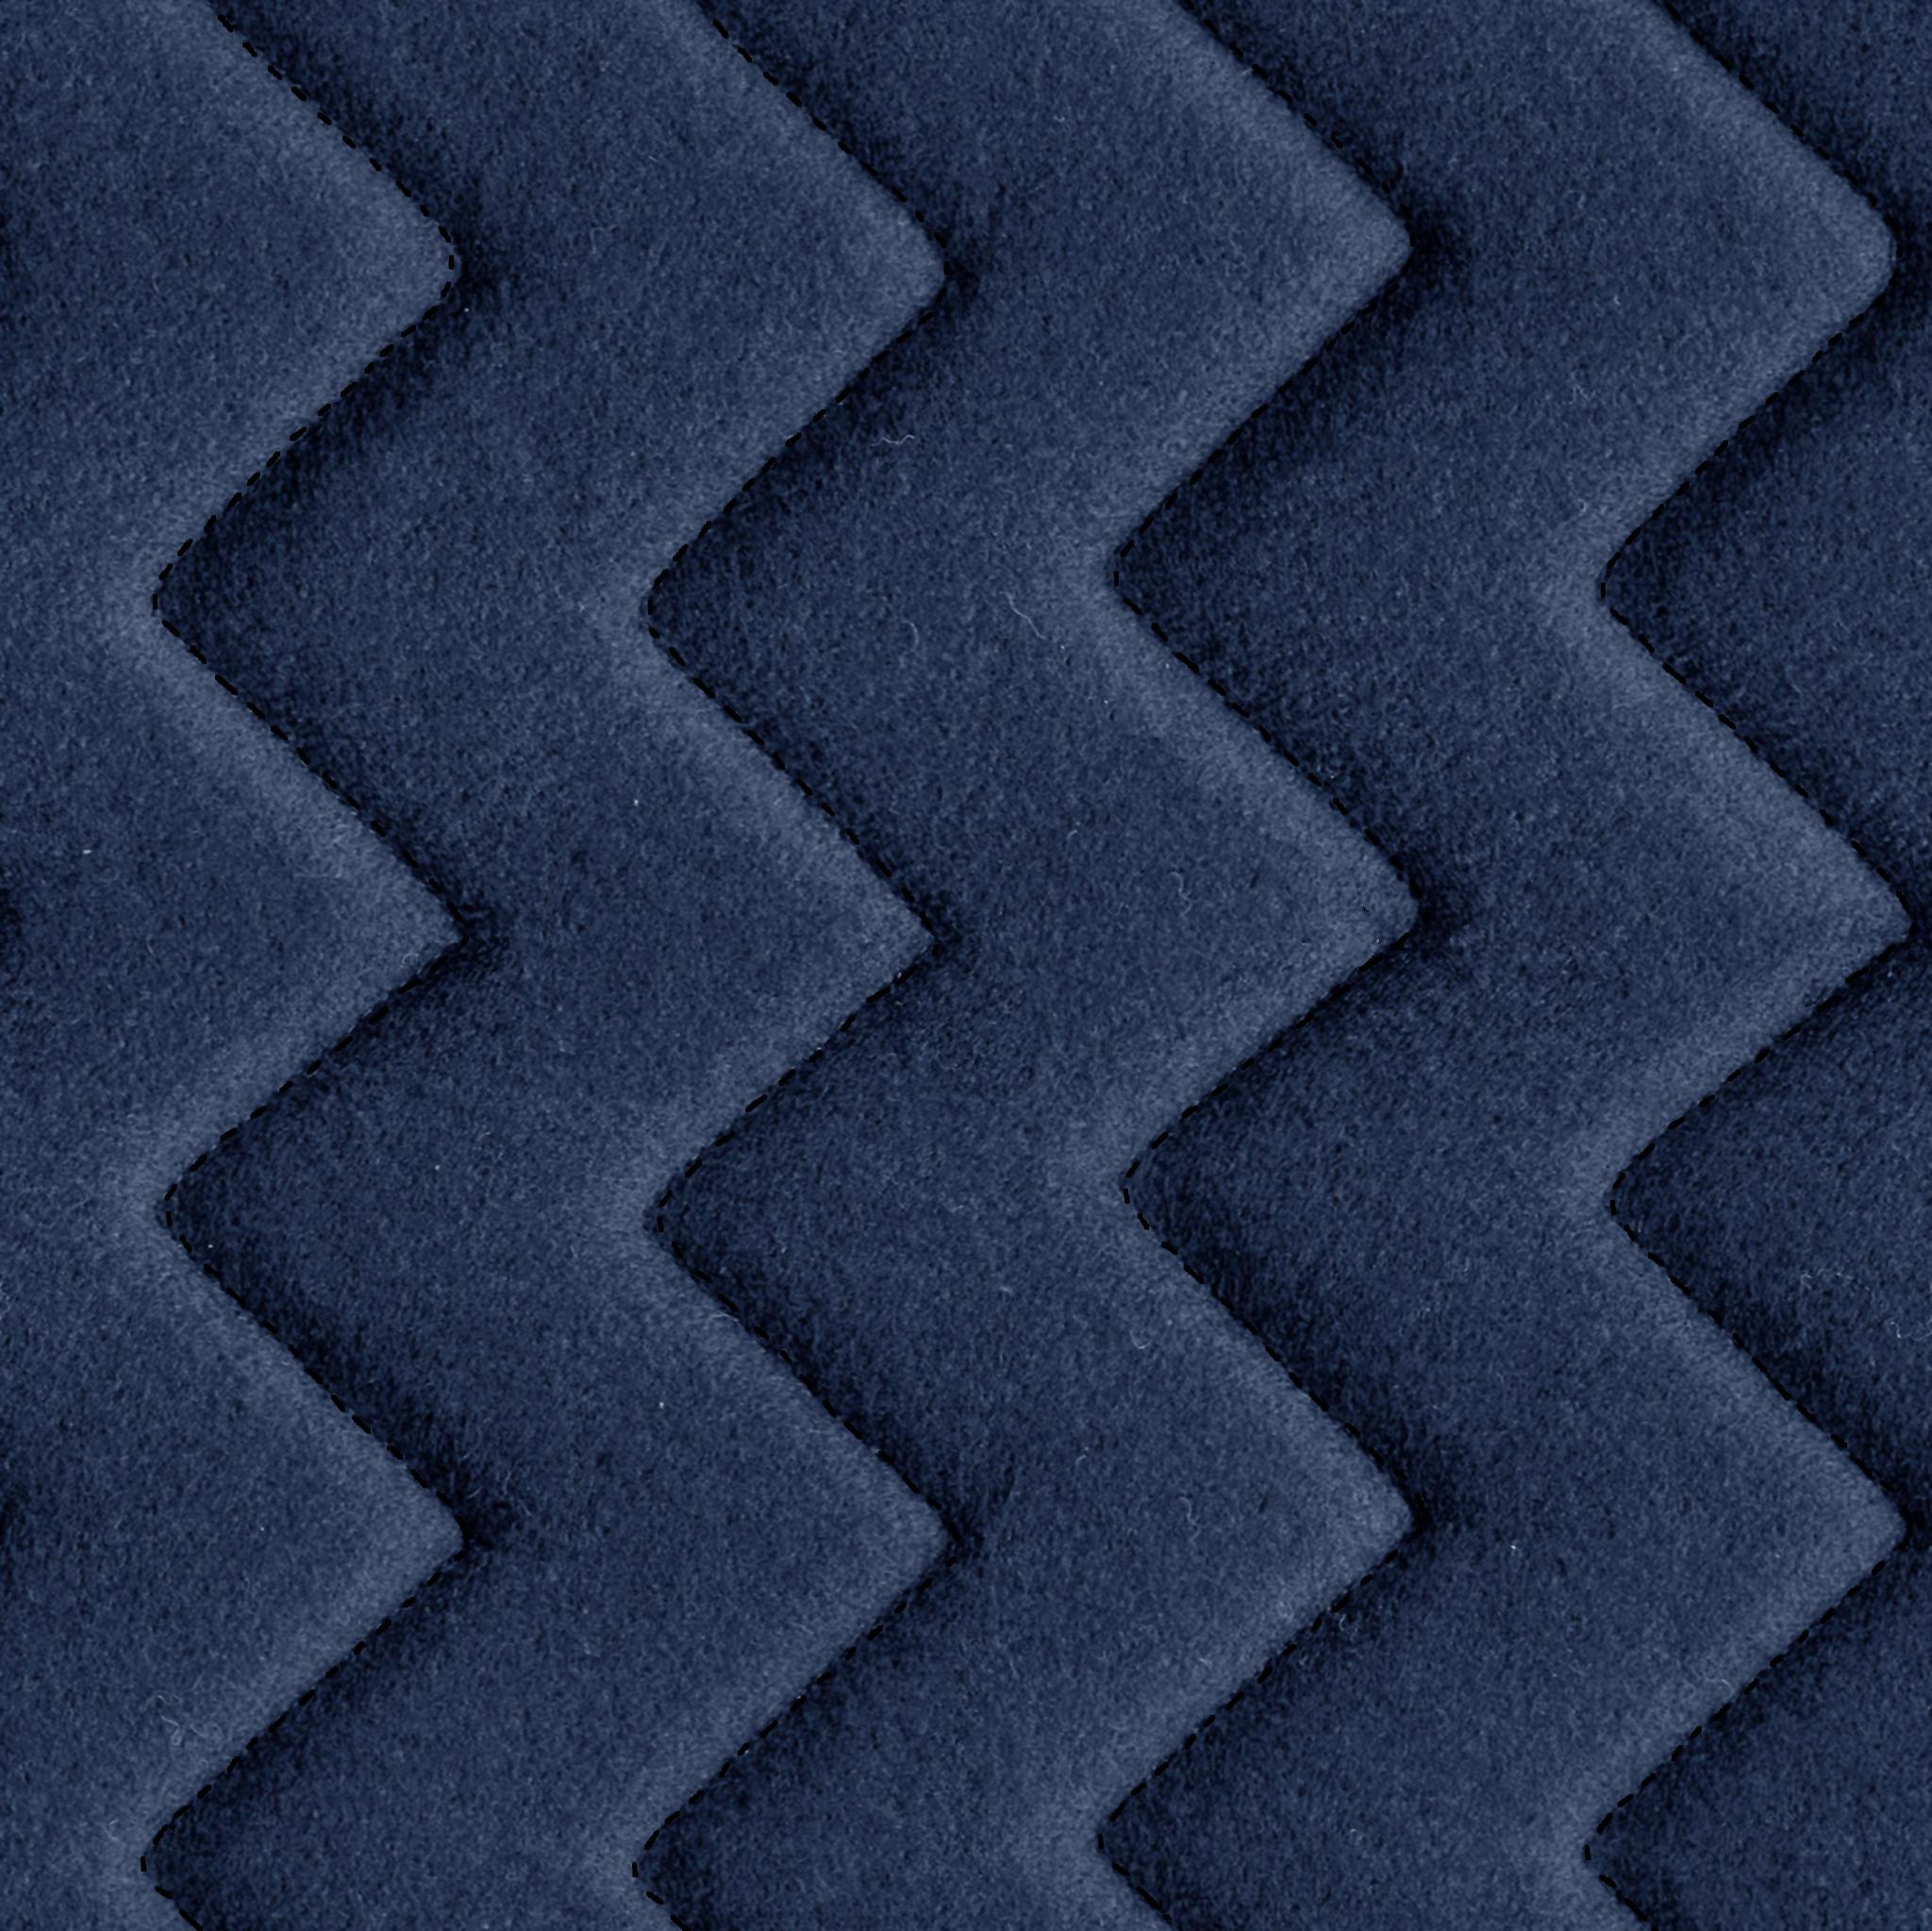 Synergy Quilt Chevron Alike Upholstery Fabrics From Camira Fabrics